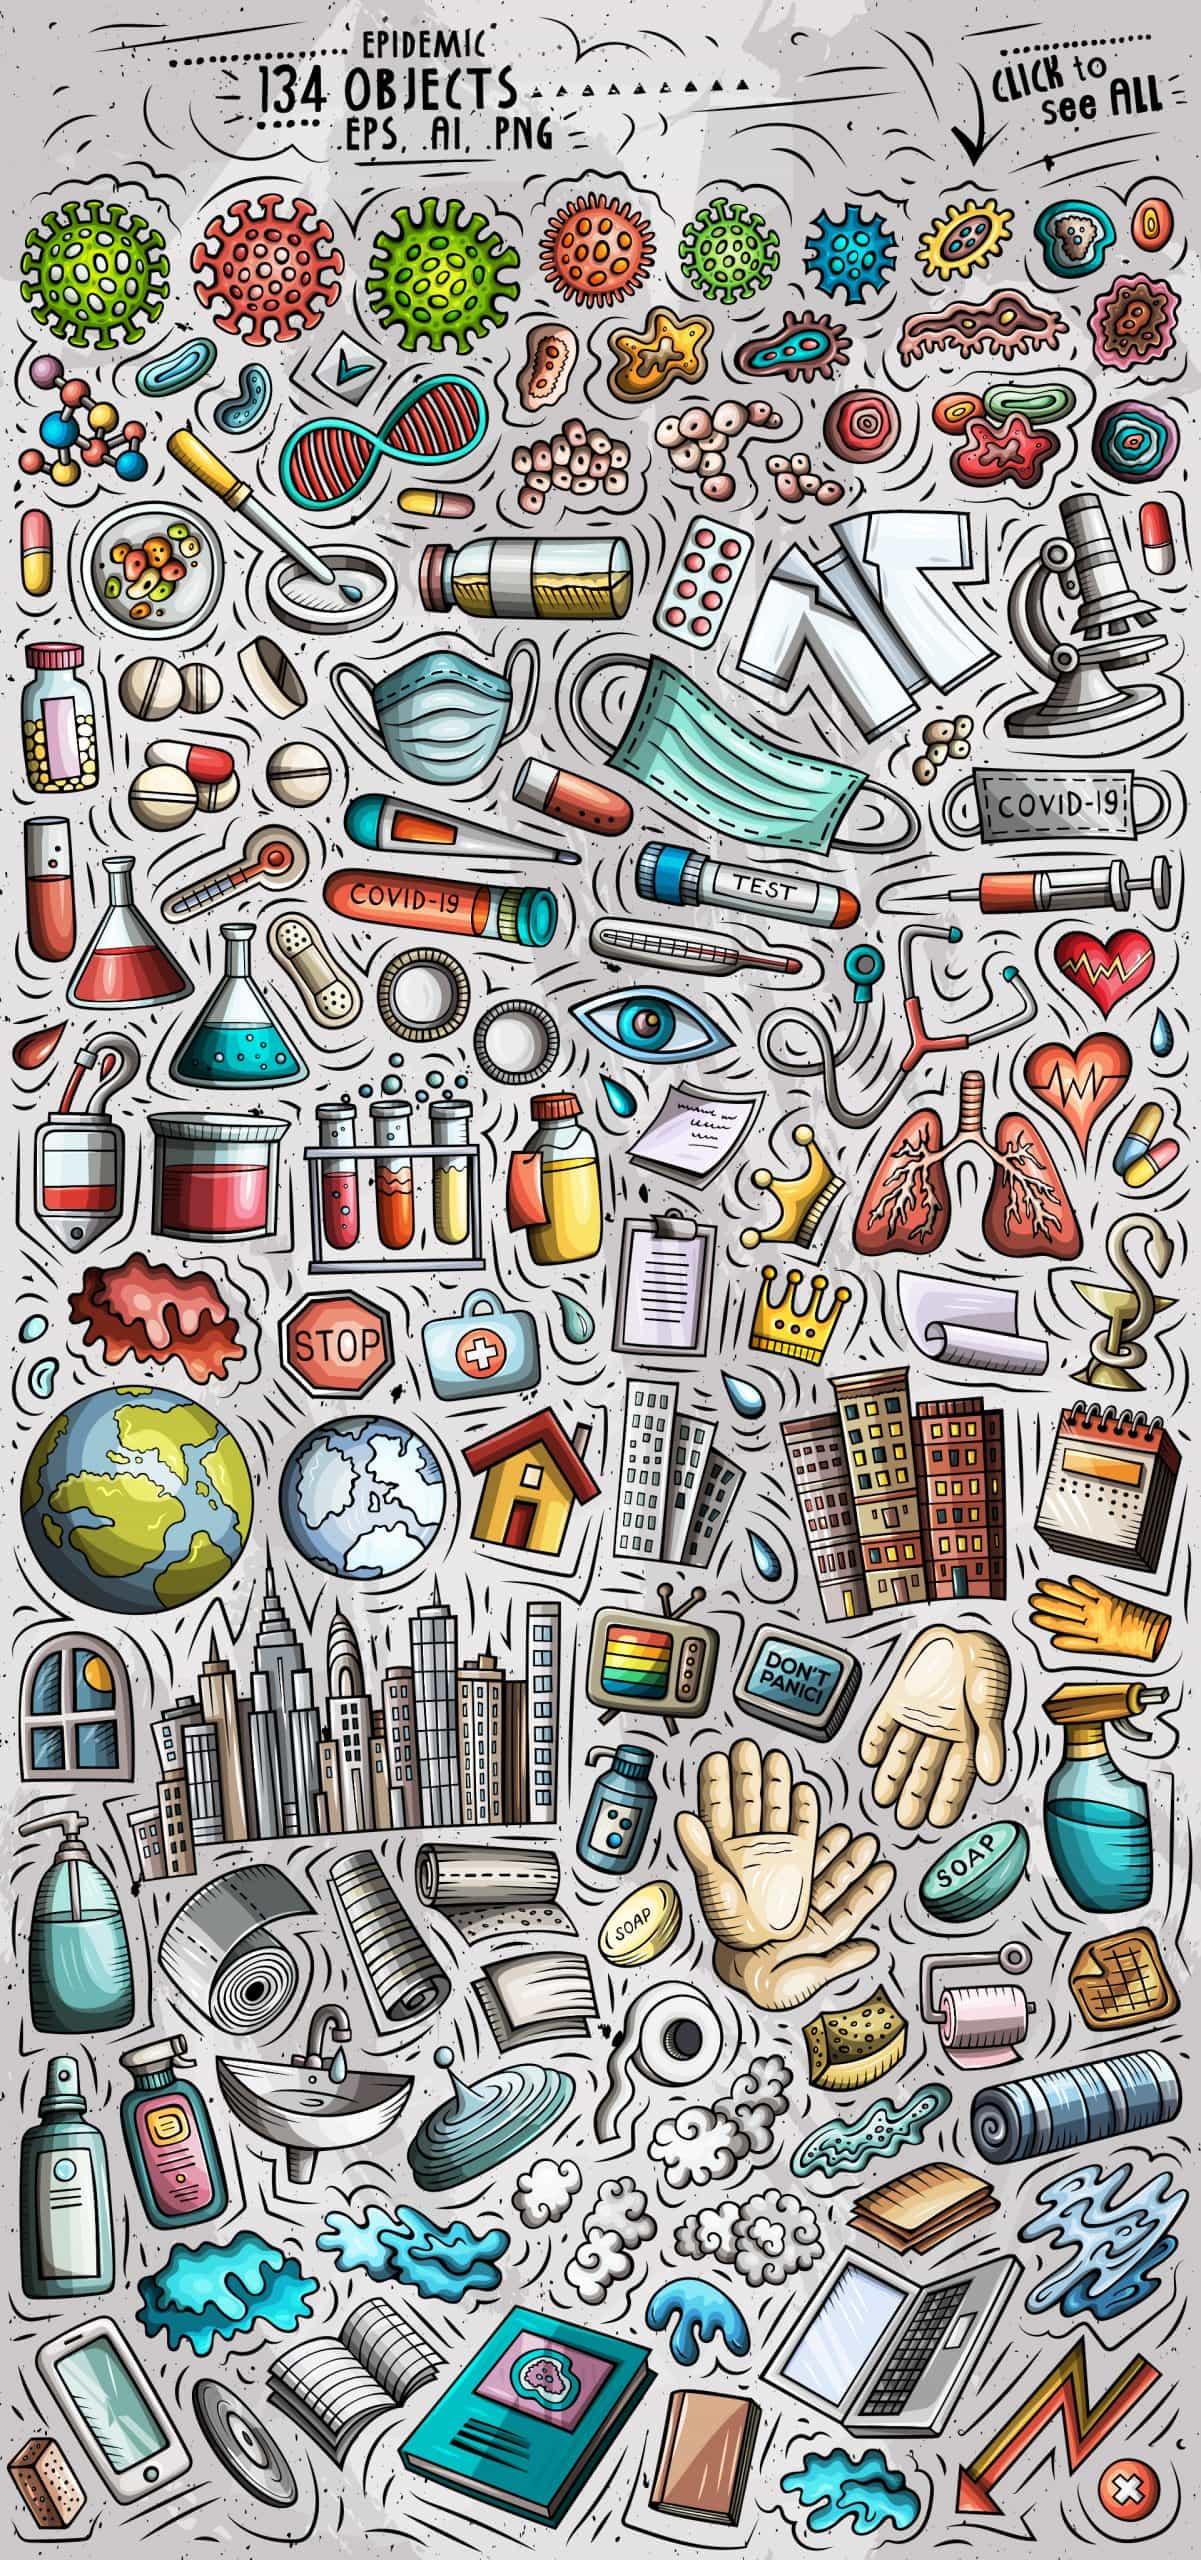 Epidemic Objects Set By Balabolka